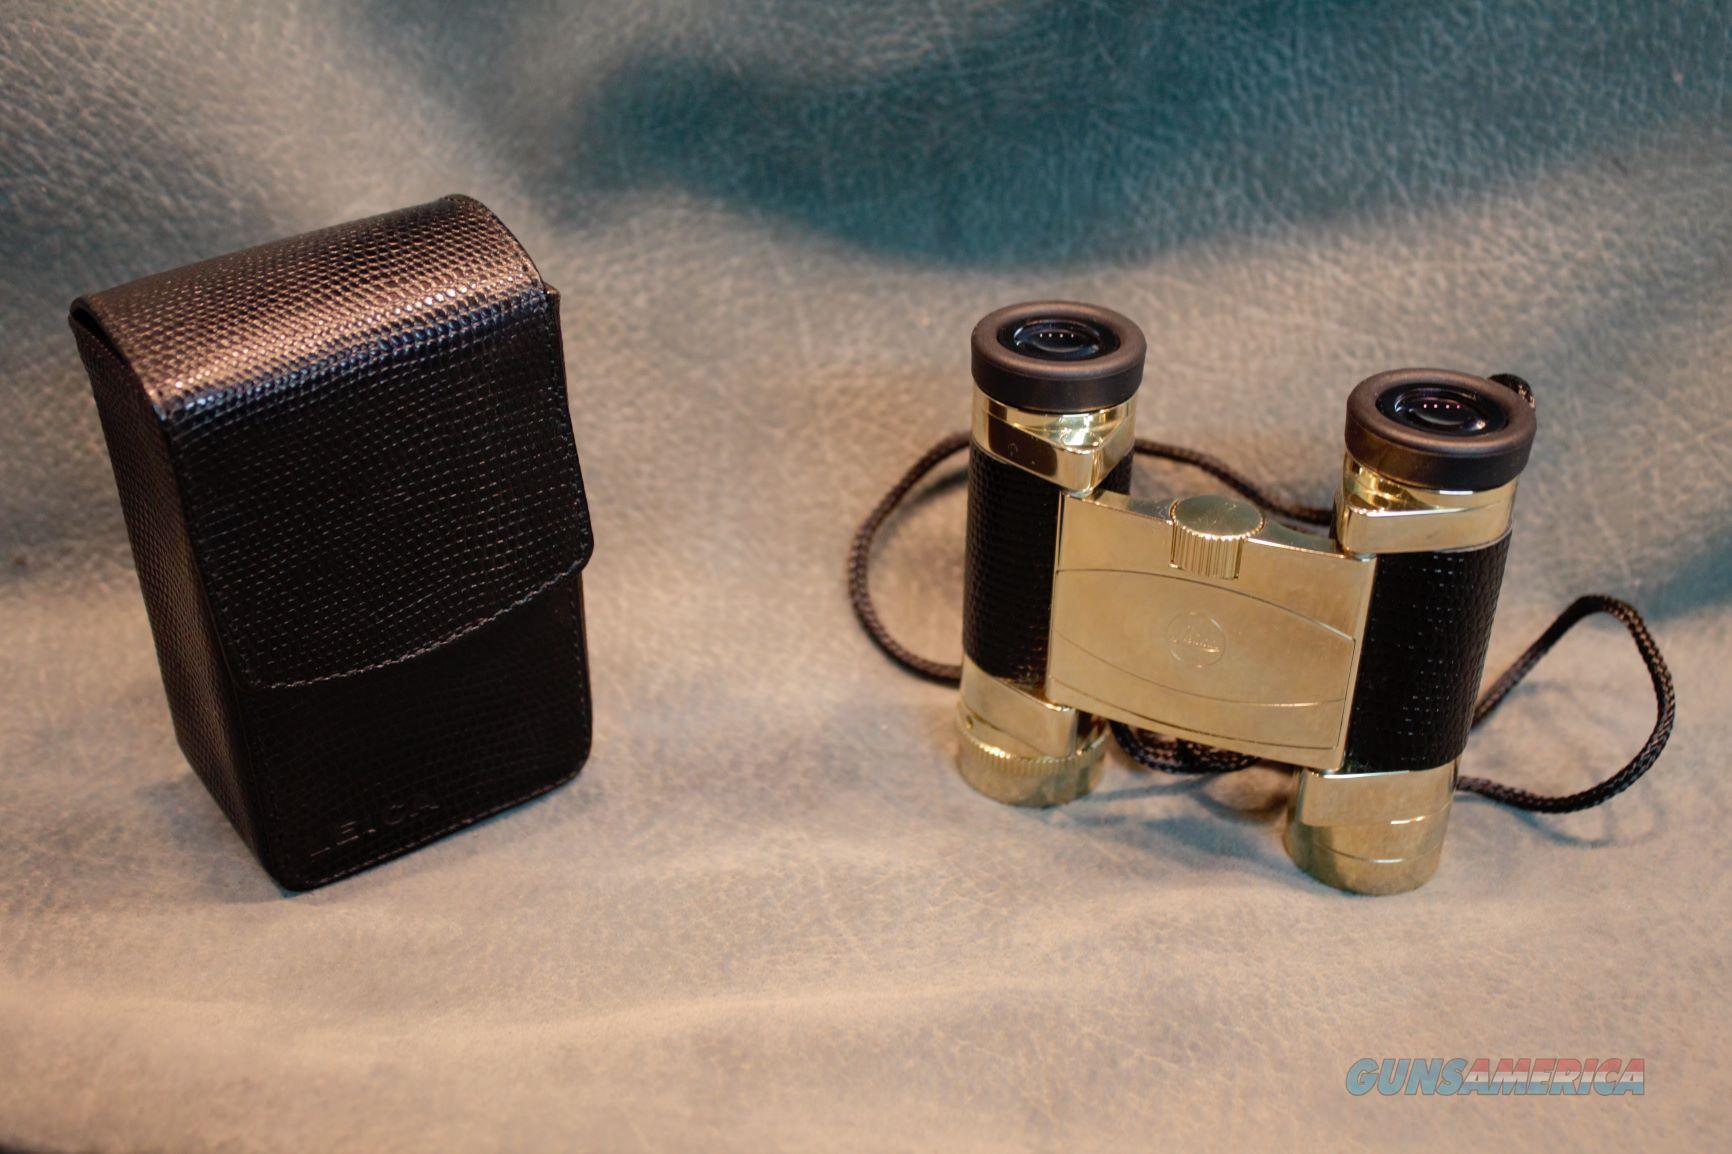 Leica Trinovid Limited Edition 8x20 Brass Binoculars  Non-Guns > Scopes/Mounts/Rings & Optics > Non-Scope Optics > Binoculars